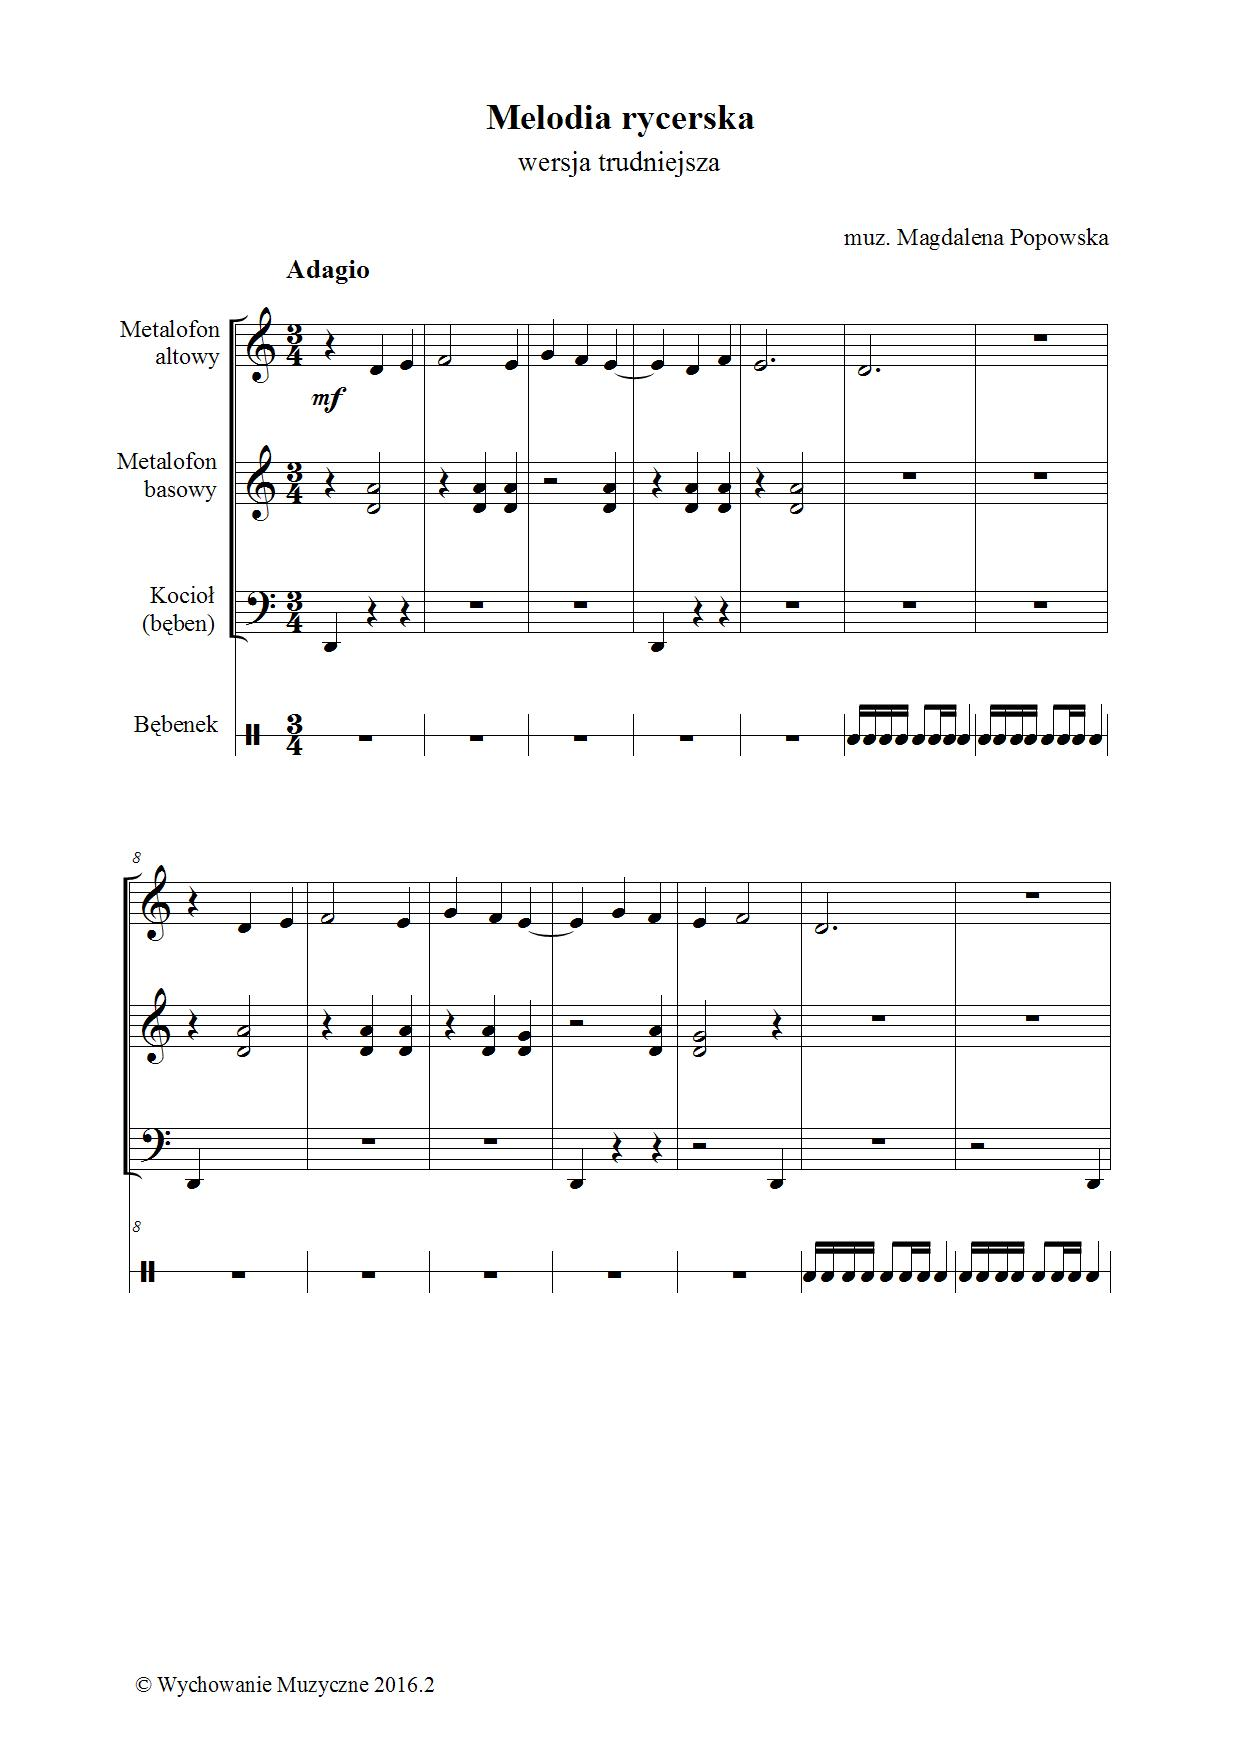 Melodia rycerska II